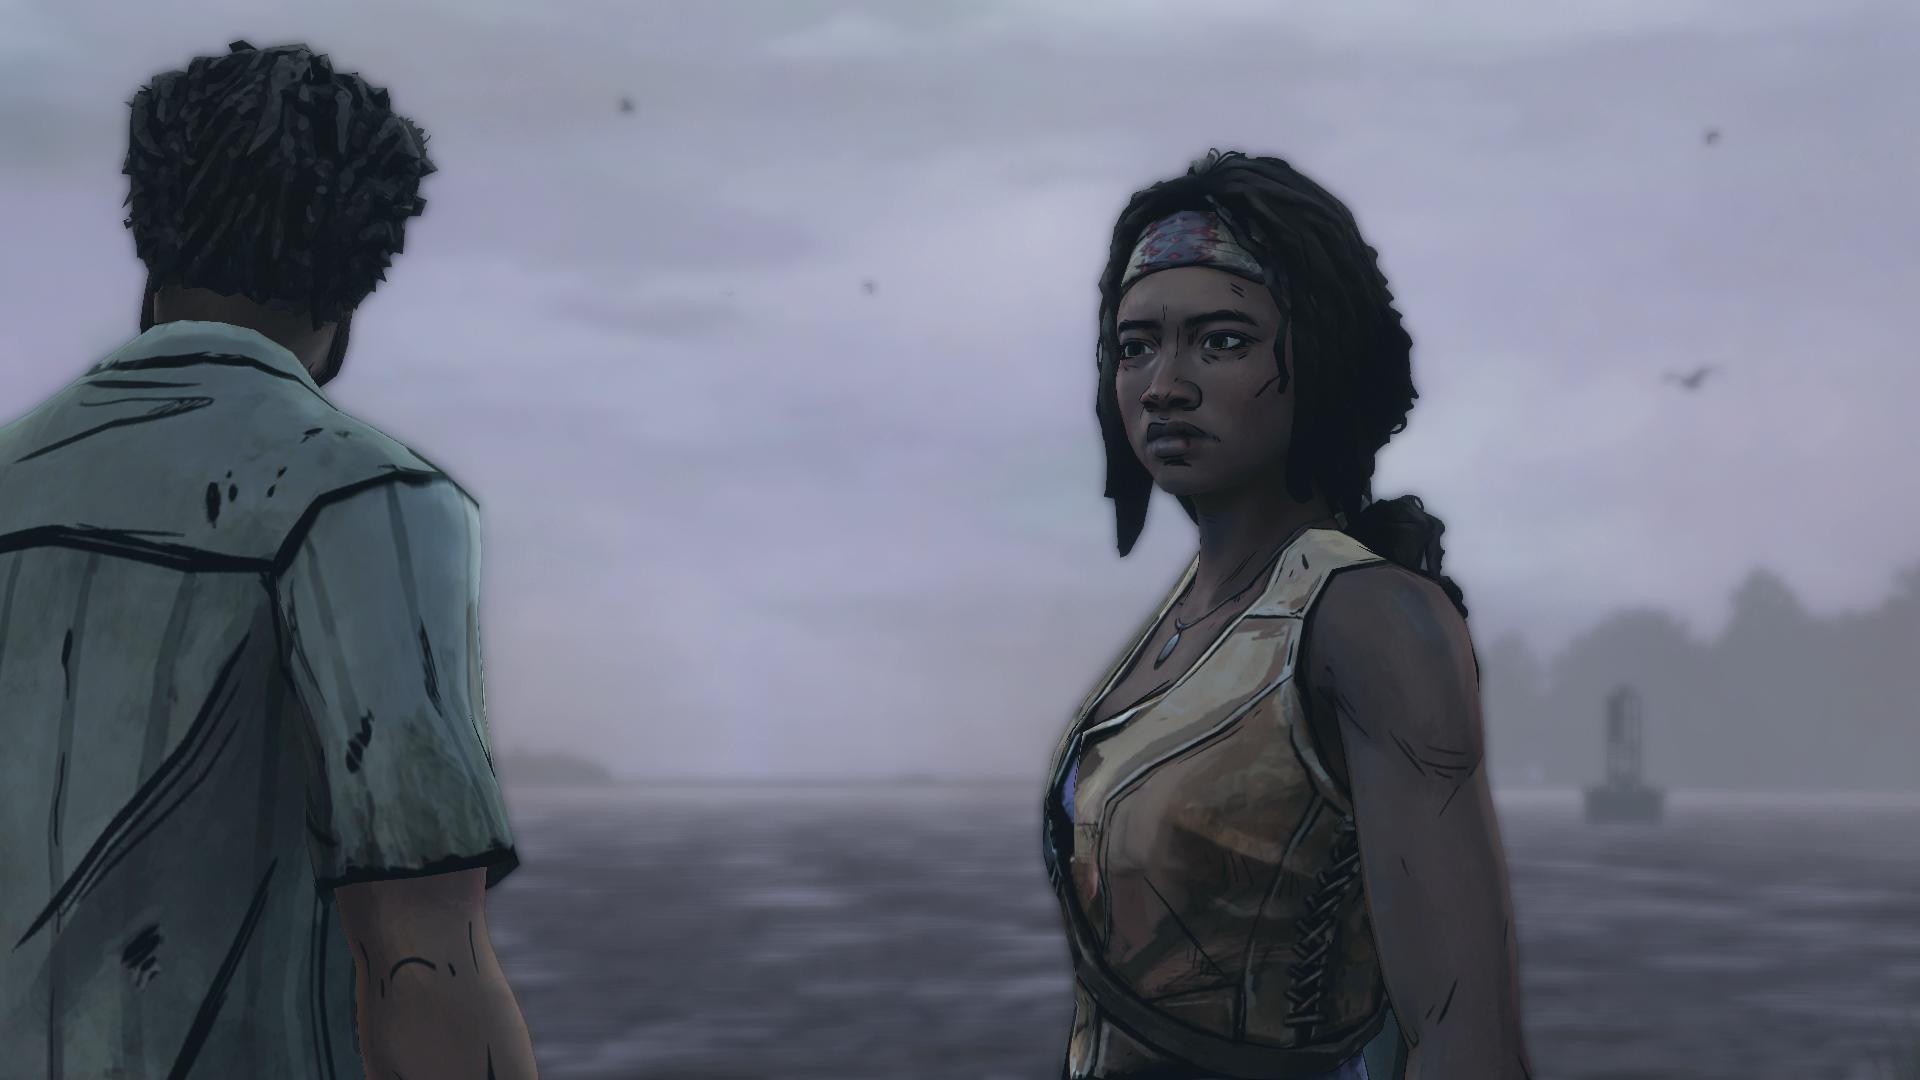 The Walking Dead: Michonne: Episode 3 - What We Deserve - Image n°6